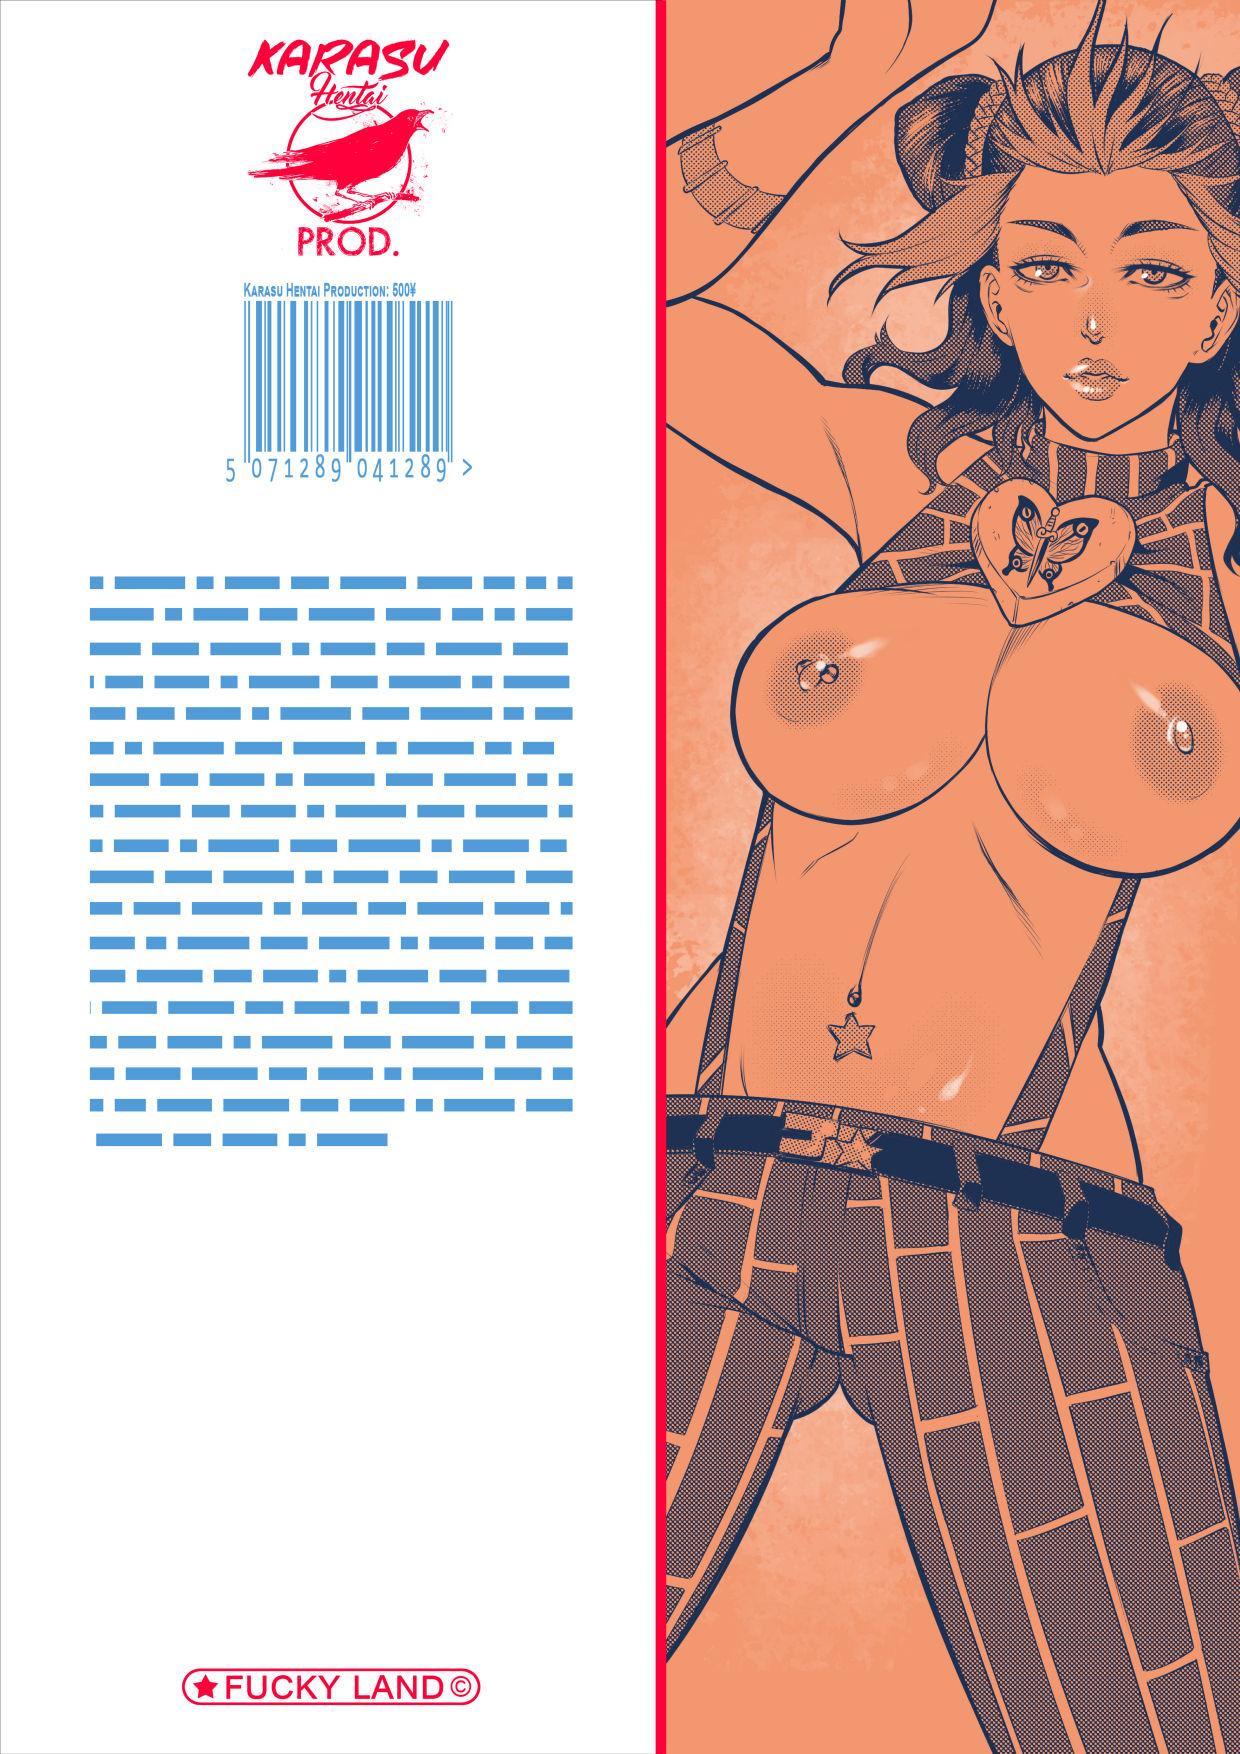 [Karasu] JoJo's Bizarre Adventure - Stone Ocean - Girls by Night + Bonus (english) 34